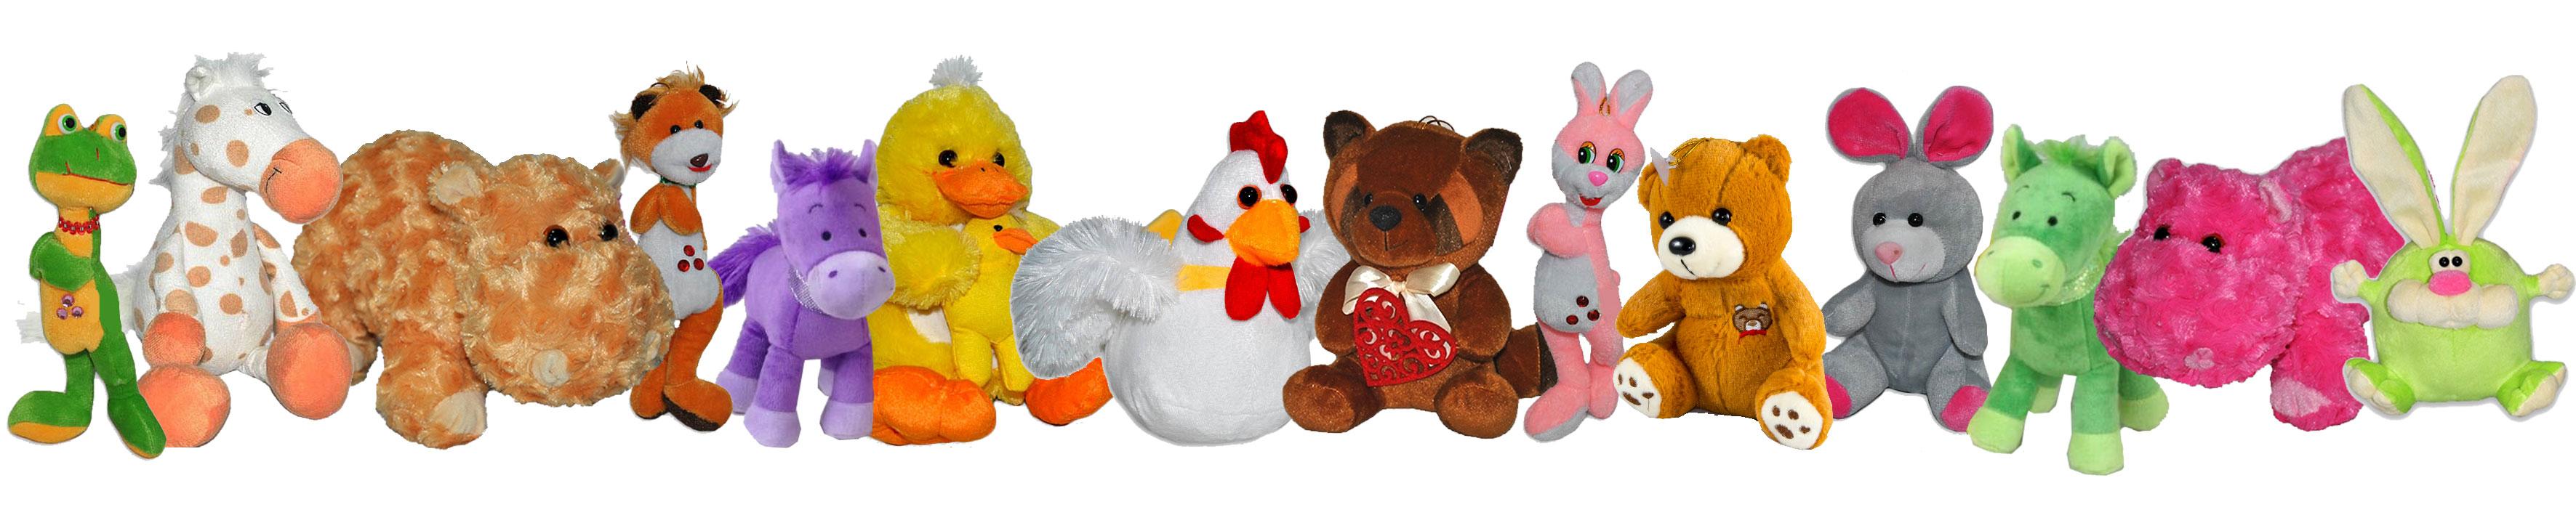 мягкие игрушки, корпоративные игрушки, брелки-игрушки